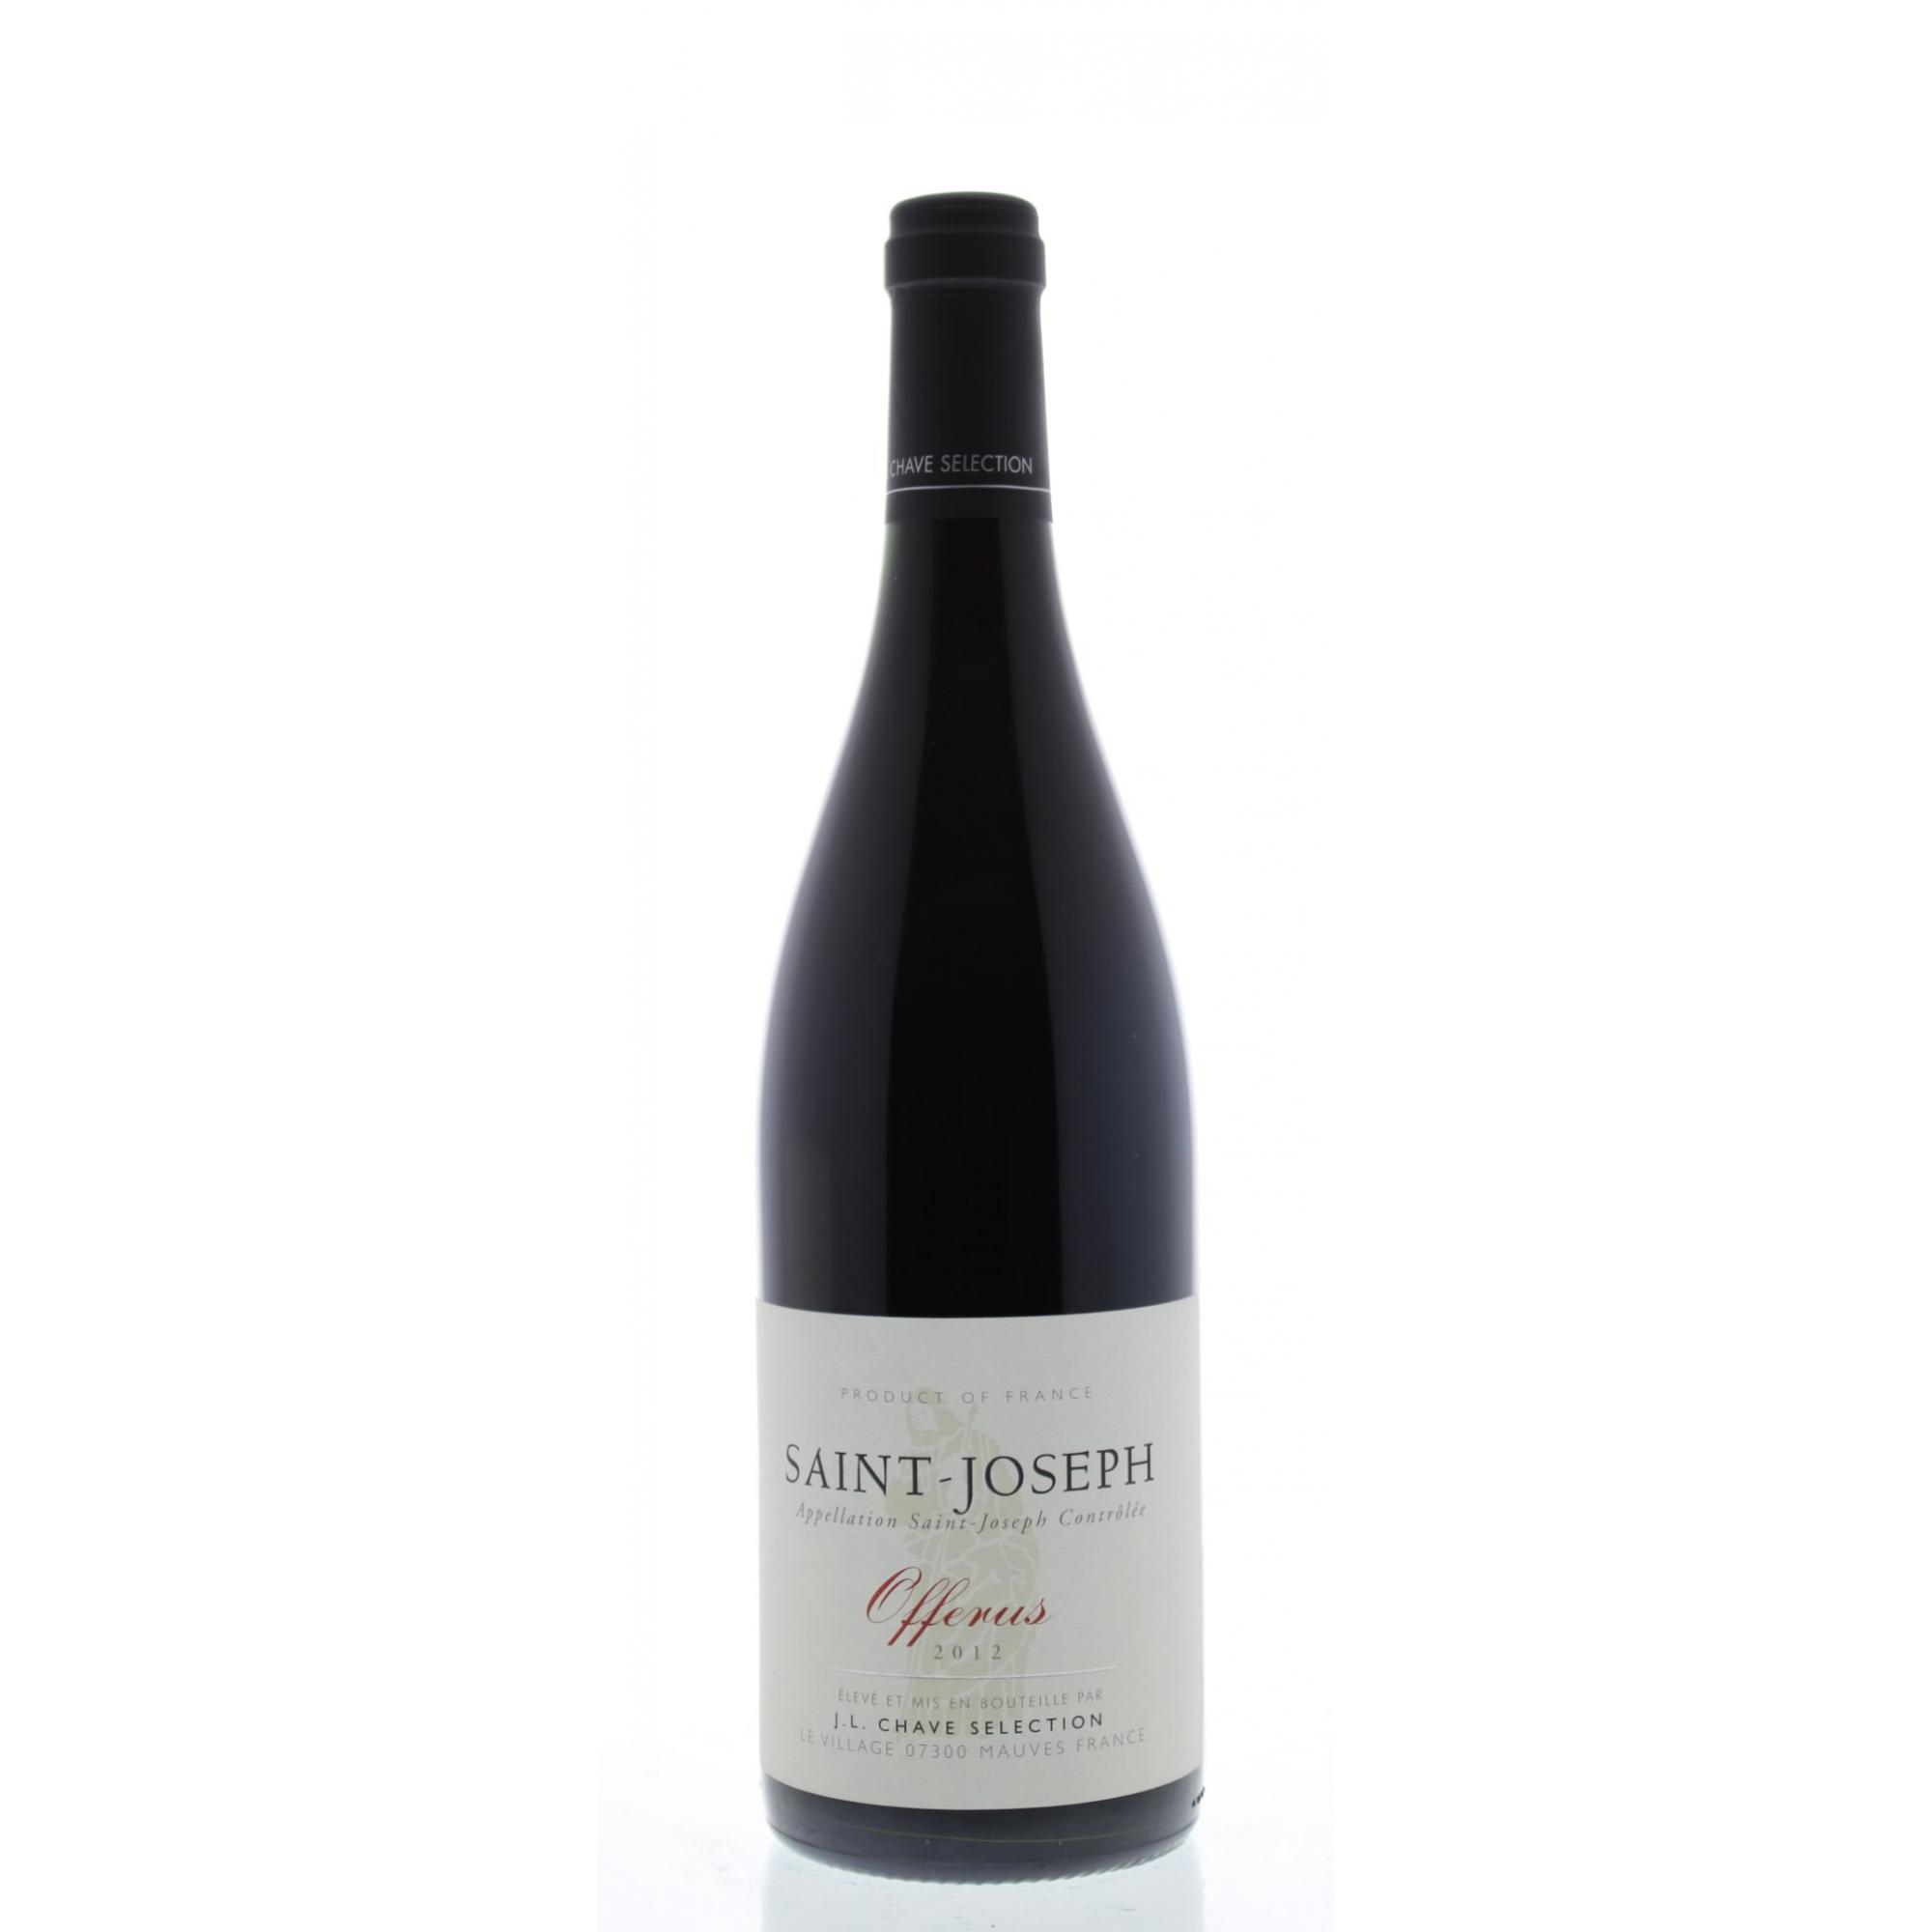 Vinho Tinto Jean Louis Chave Selection Saint Joseph Offerus 2012 750ml